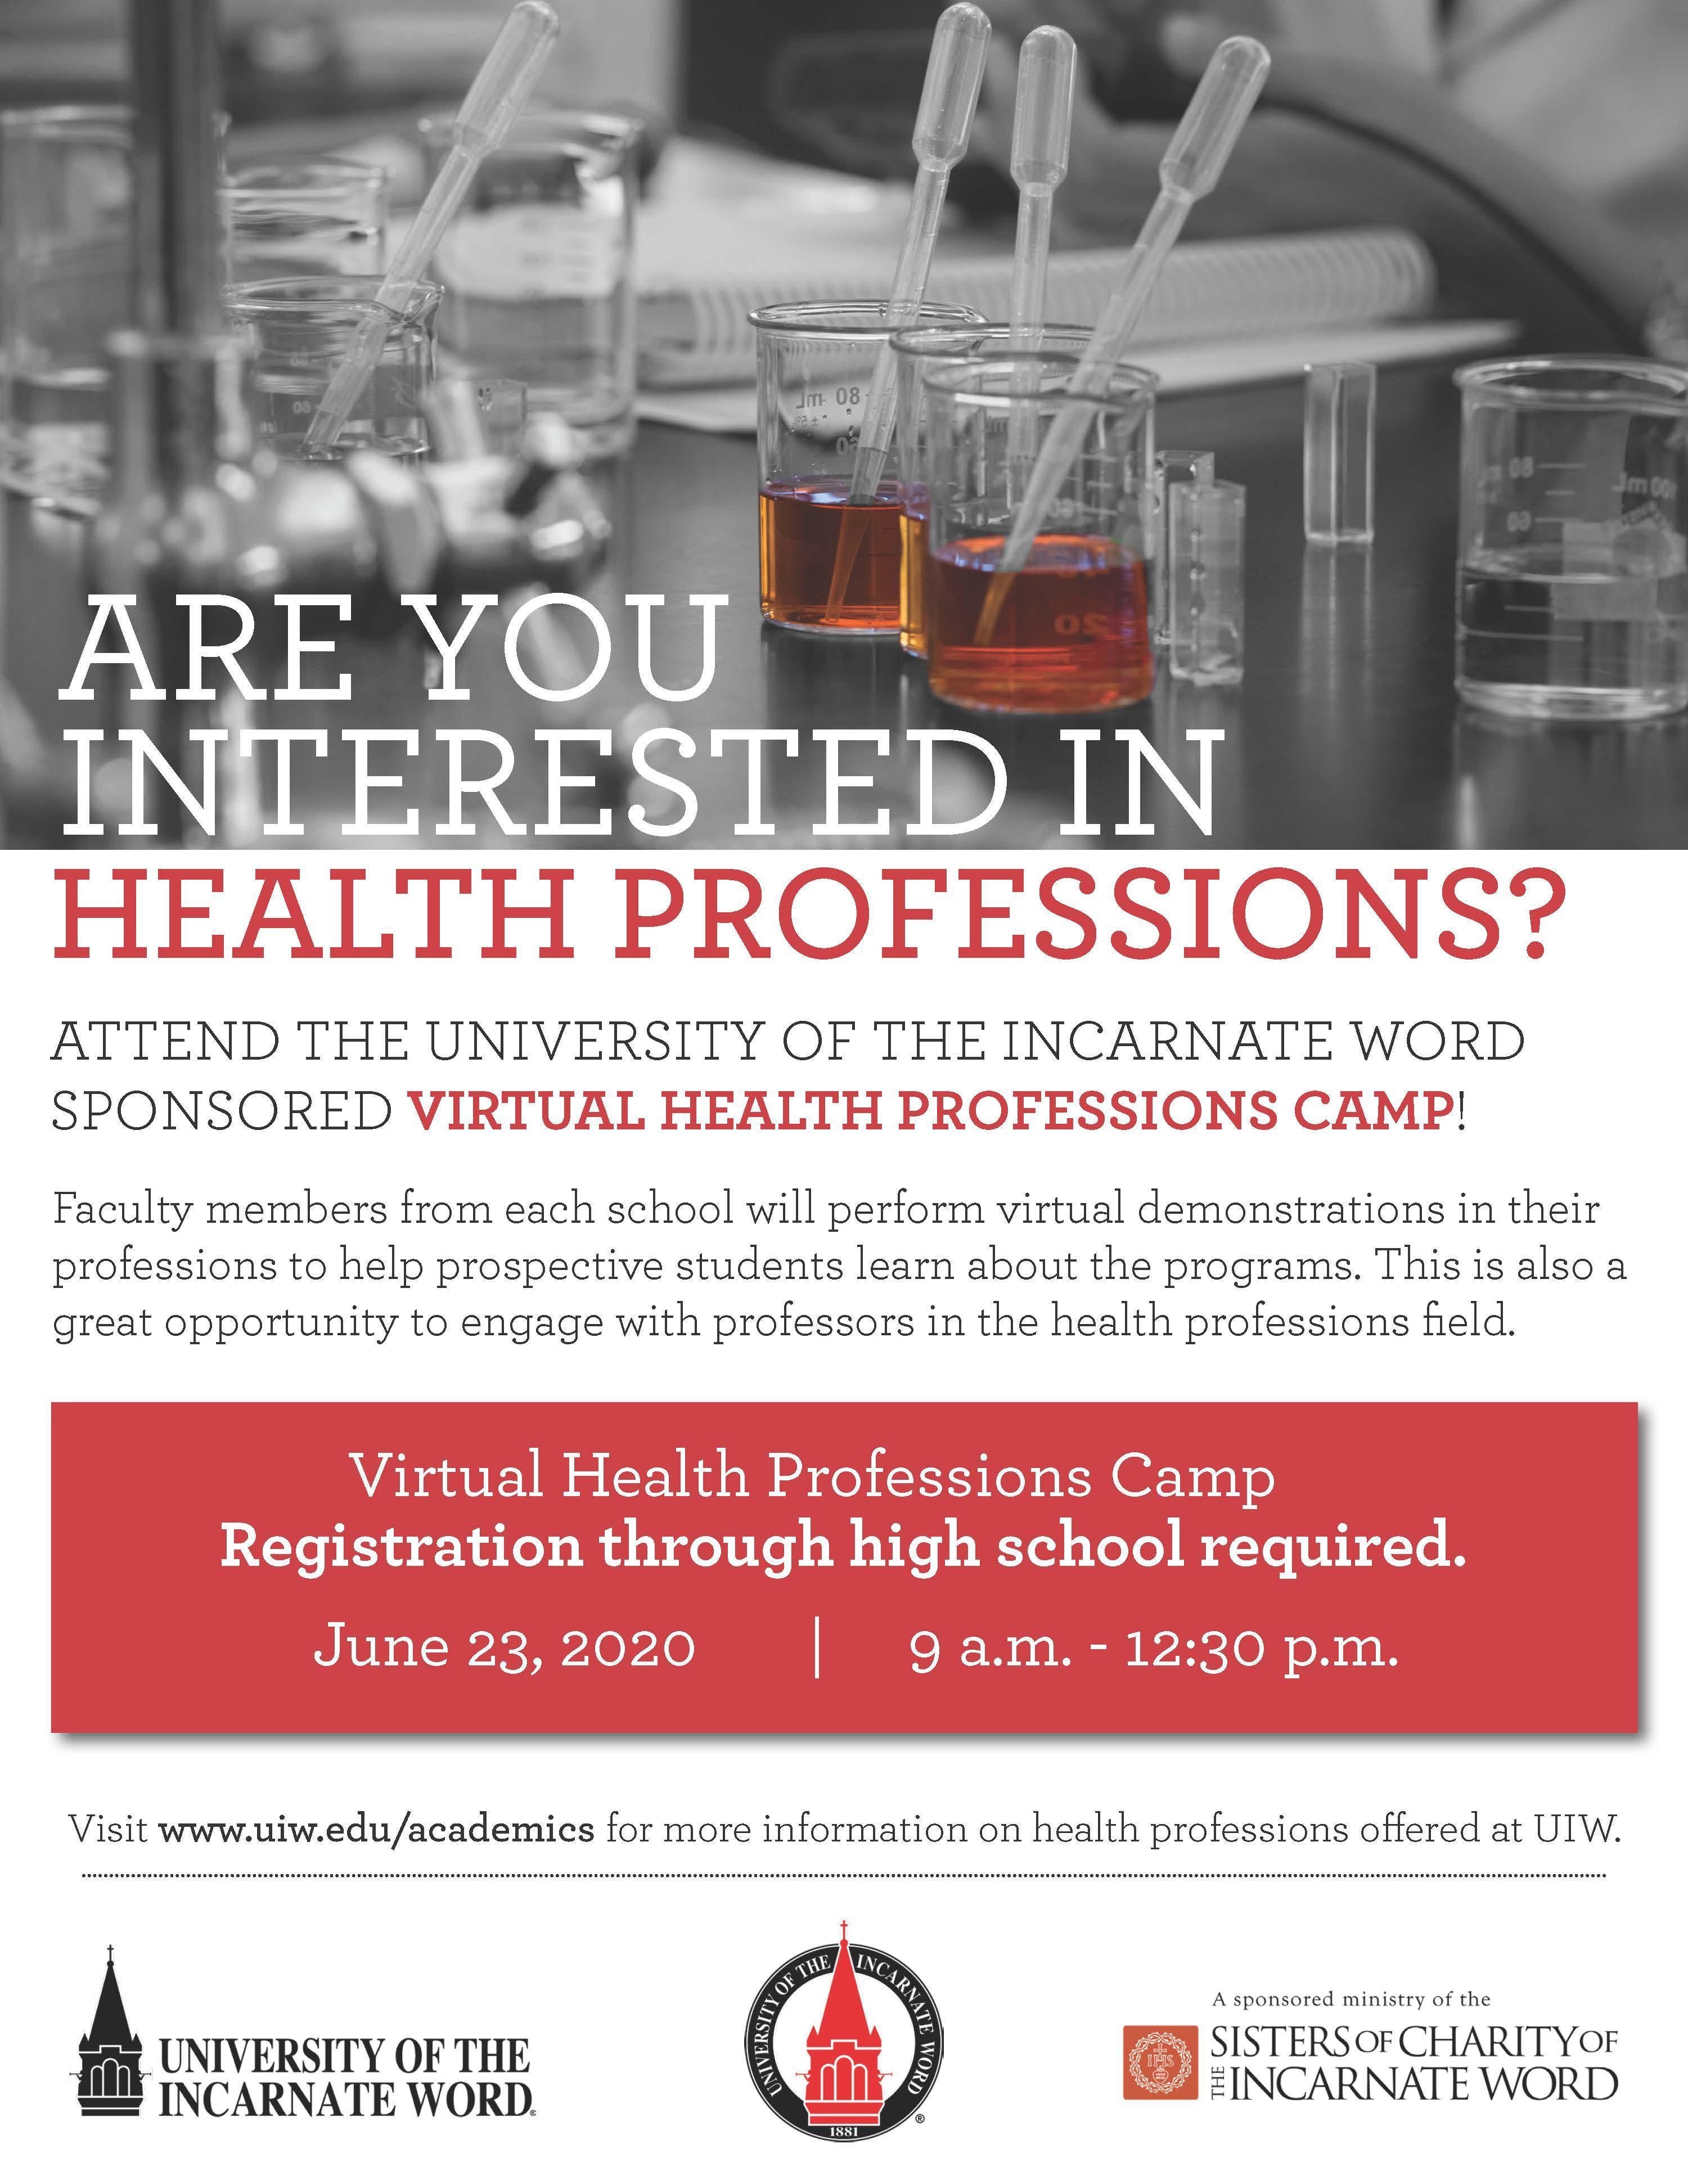 healthprofession